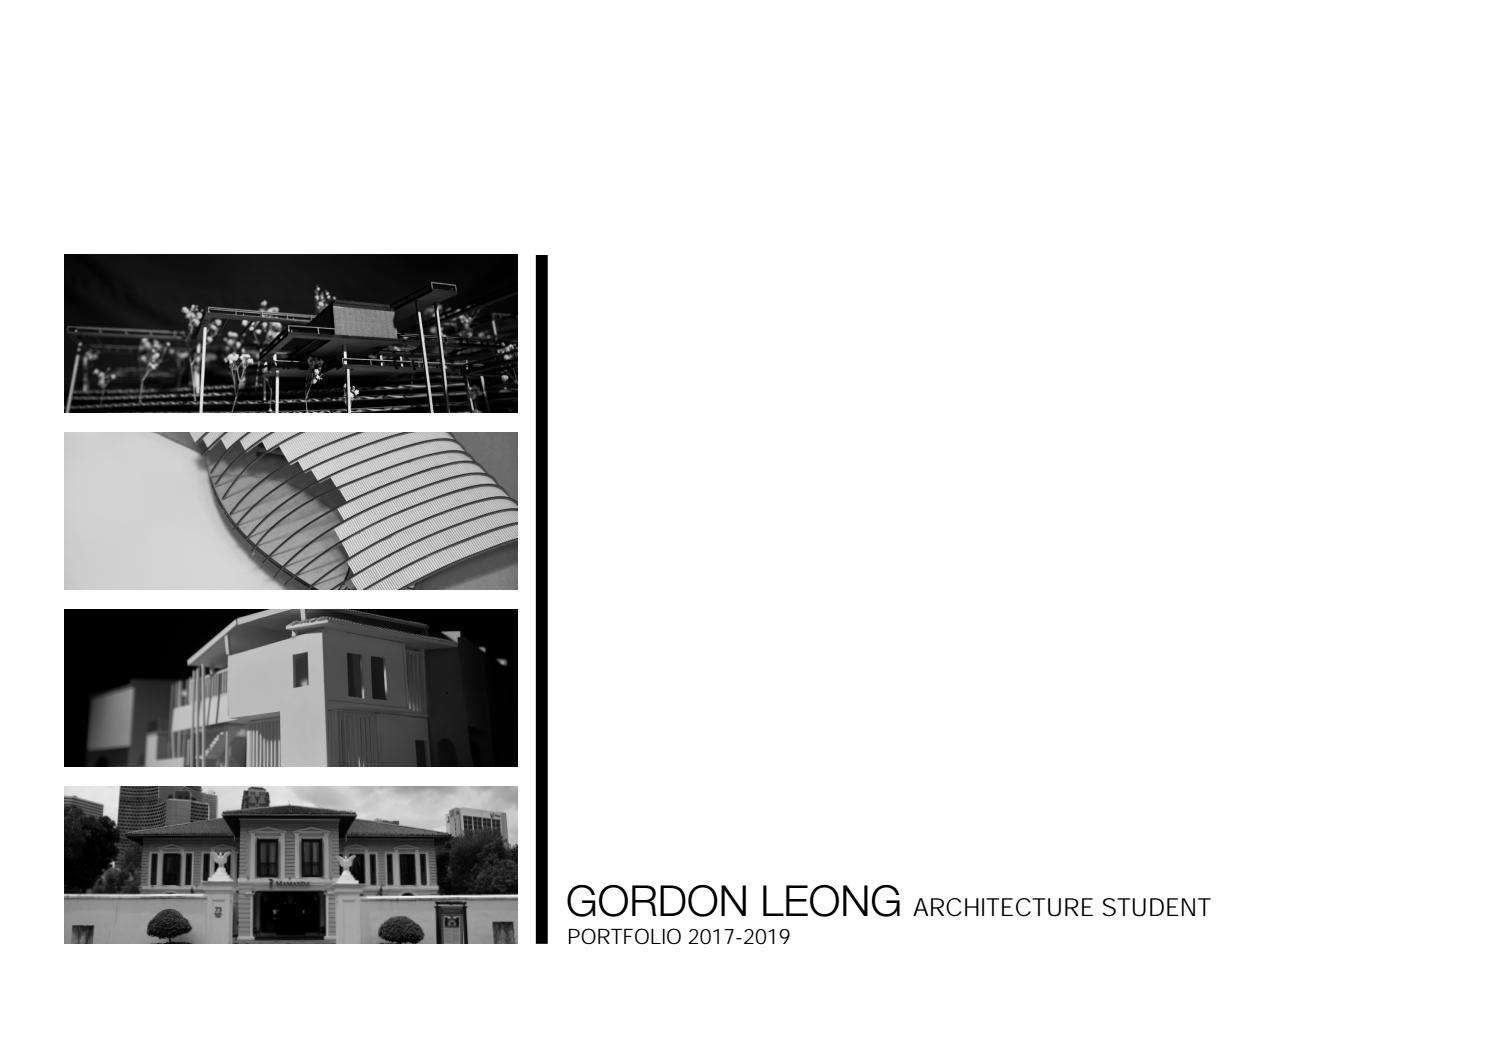 ARCHITECTURE PORTFOLIO Y2 by Gordon Leong - issuu